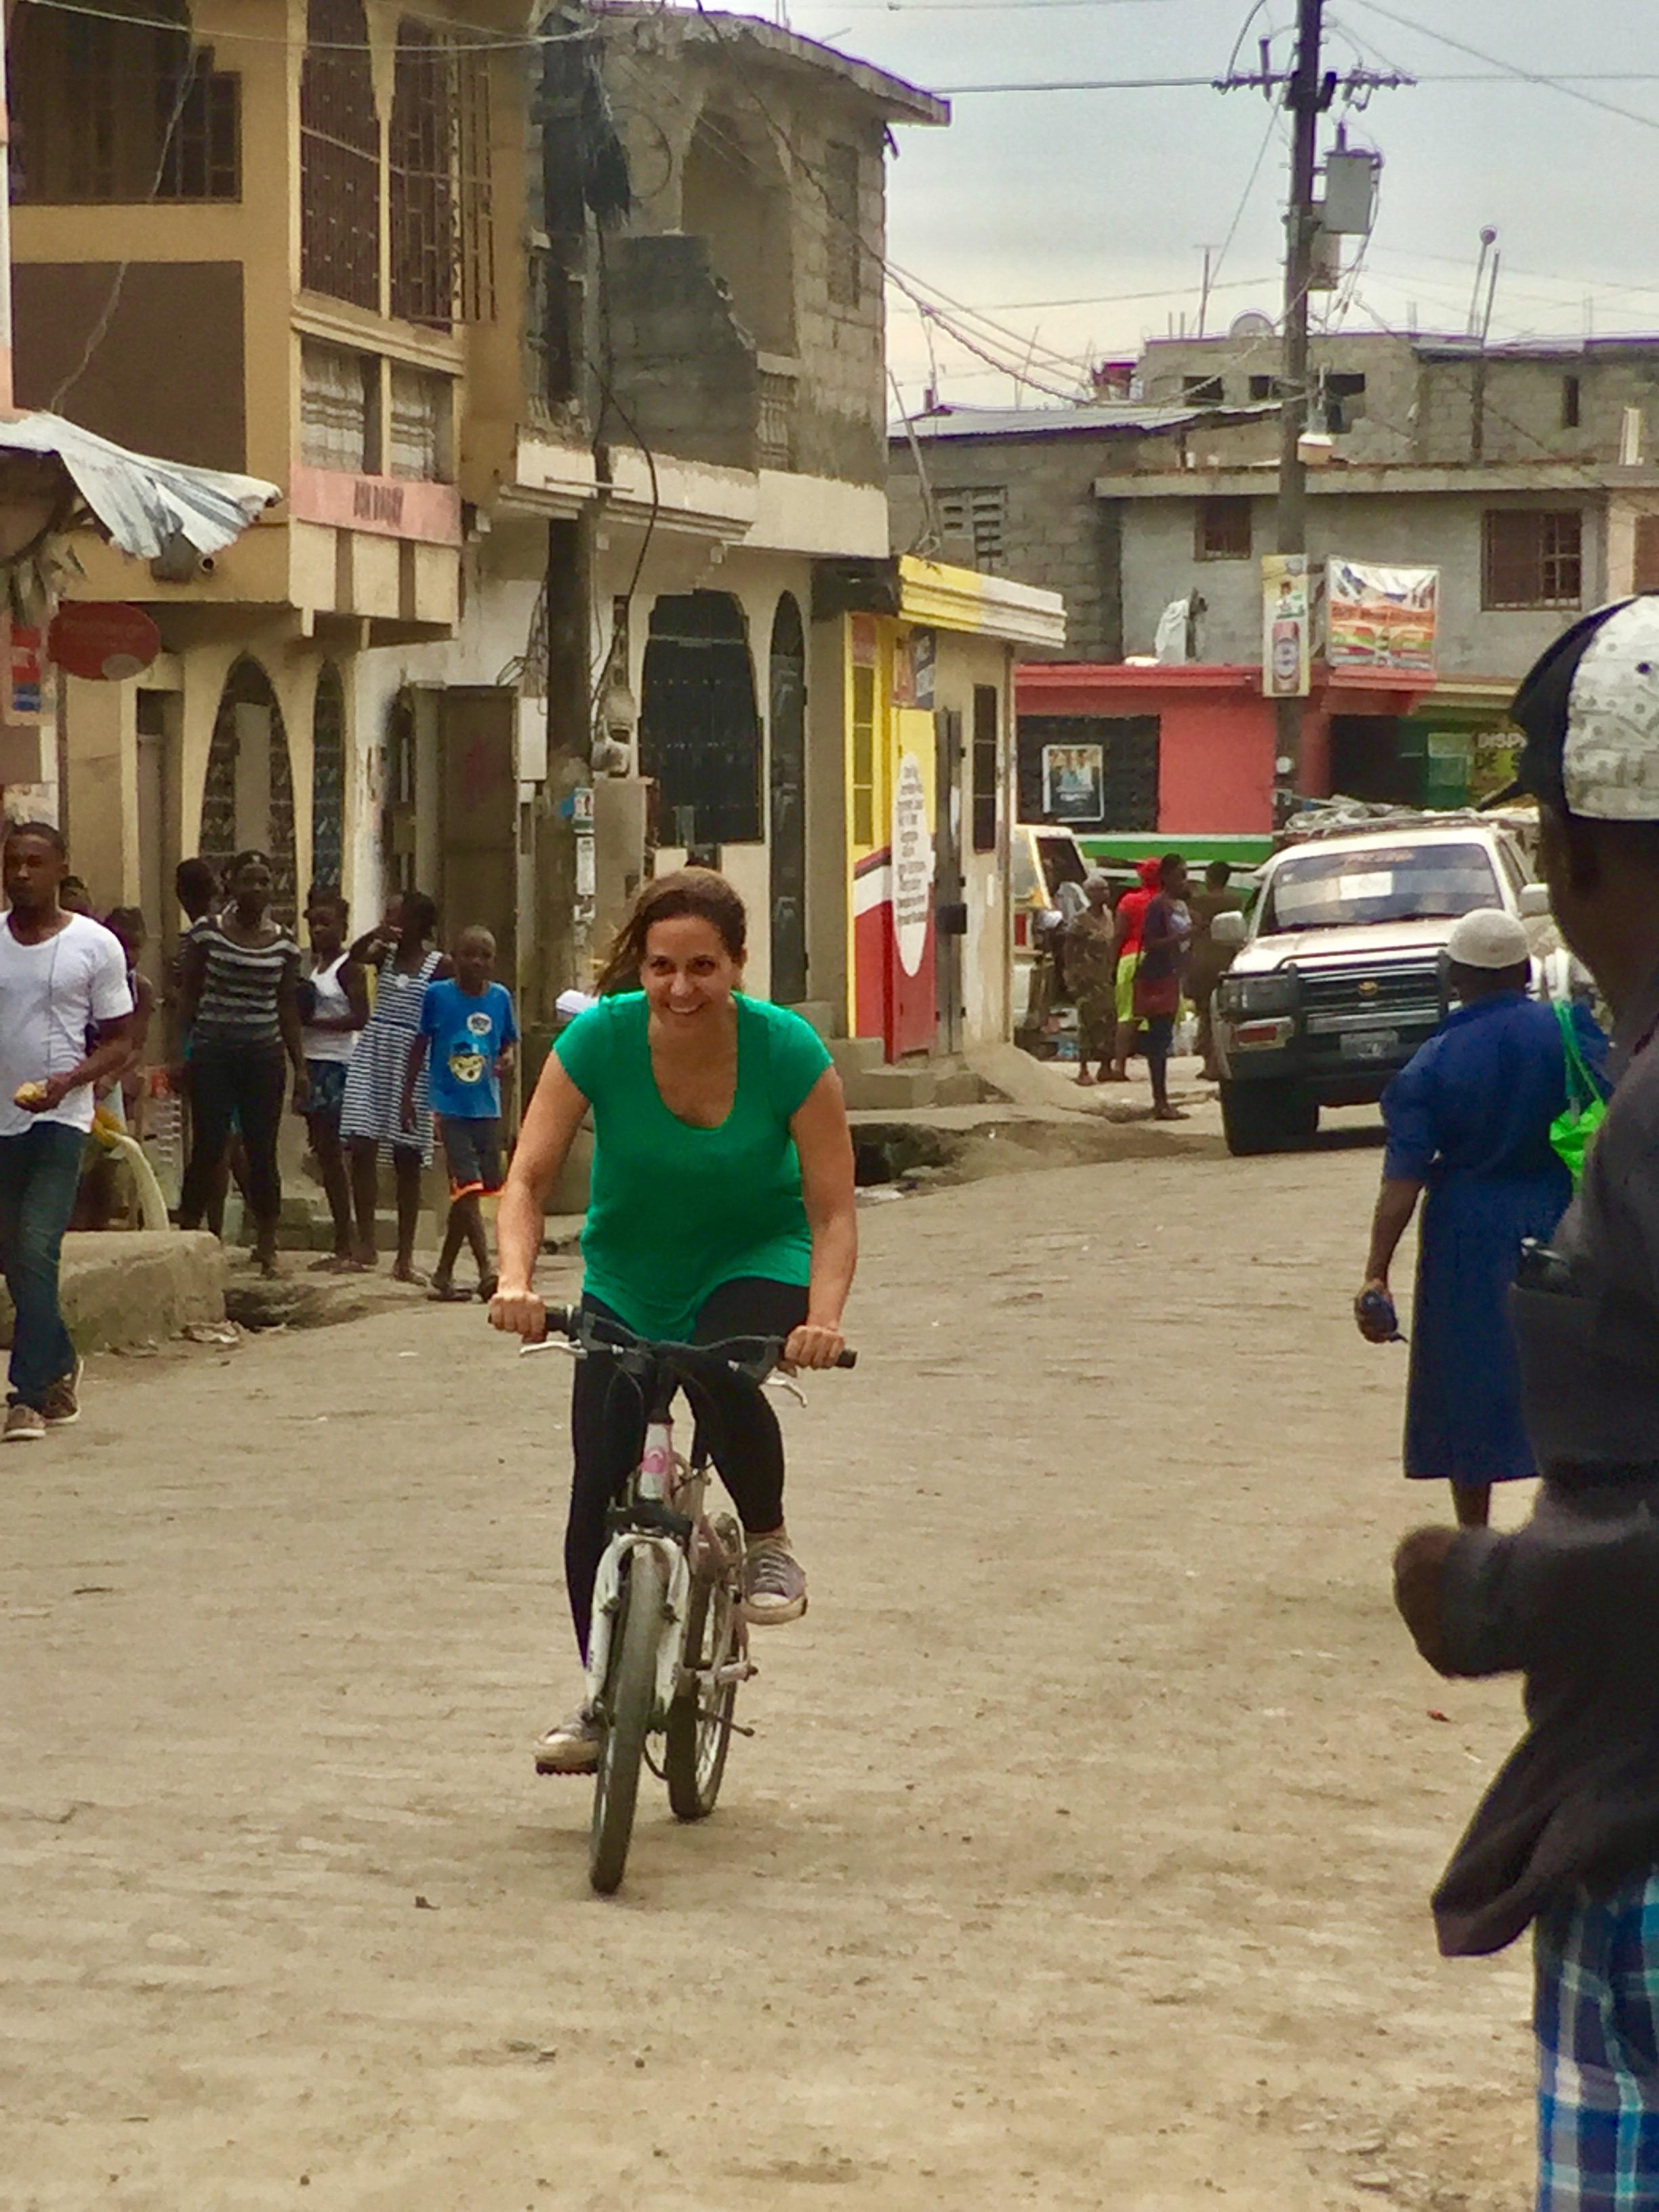 Jennifer riding bikes with the kids in Haiti